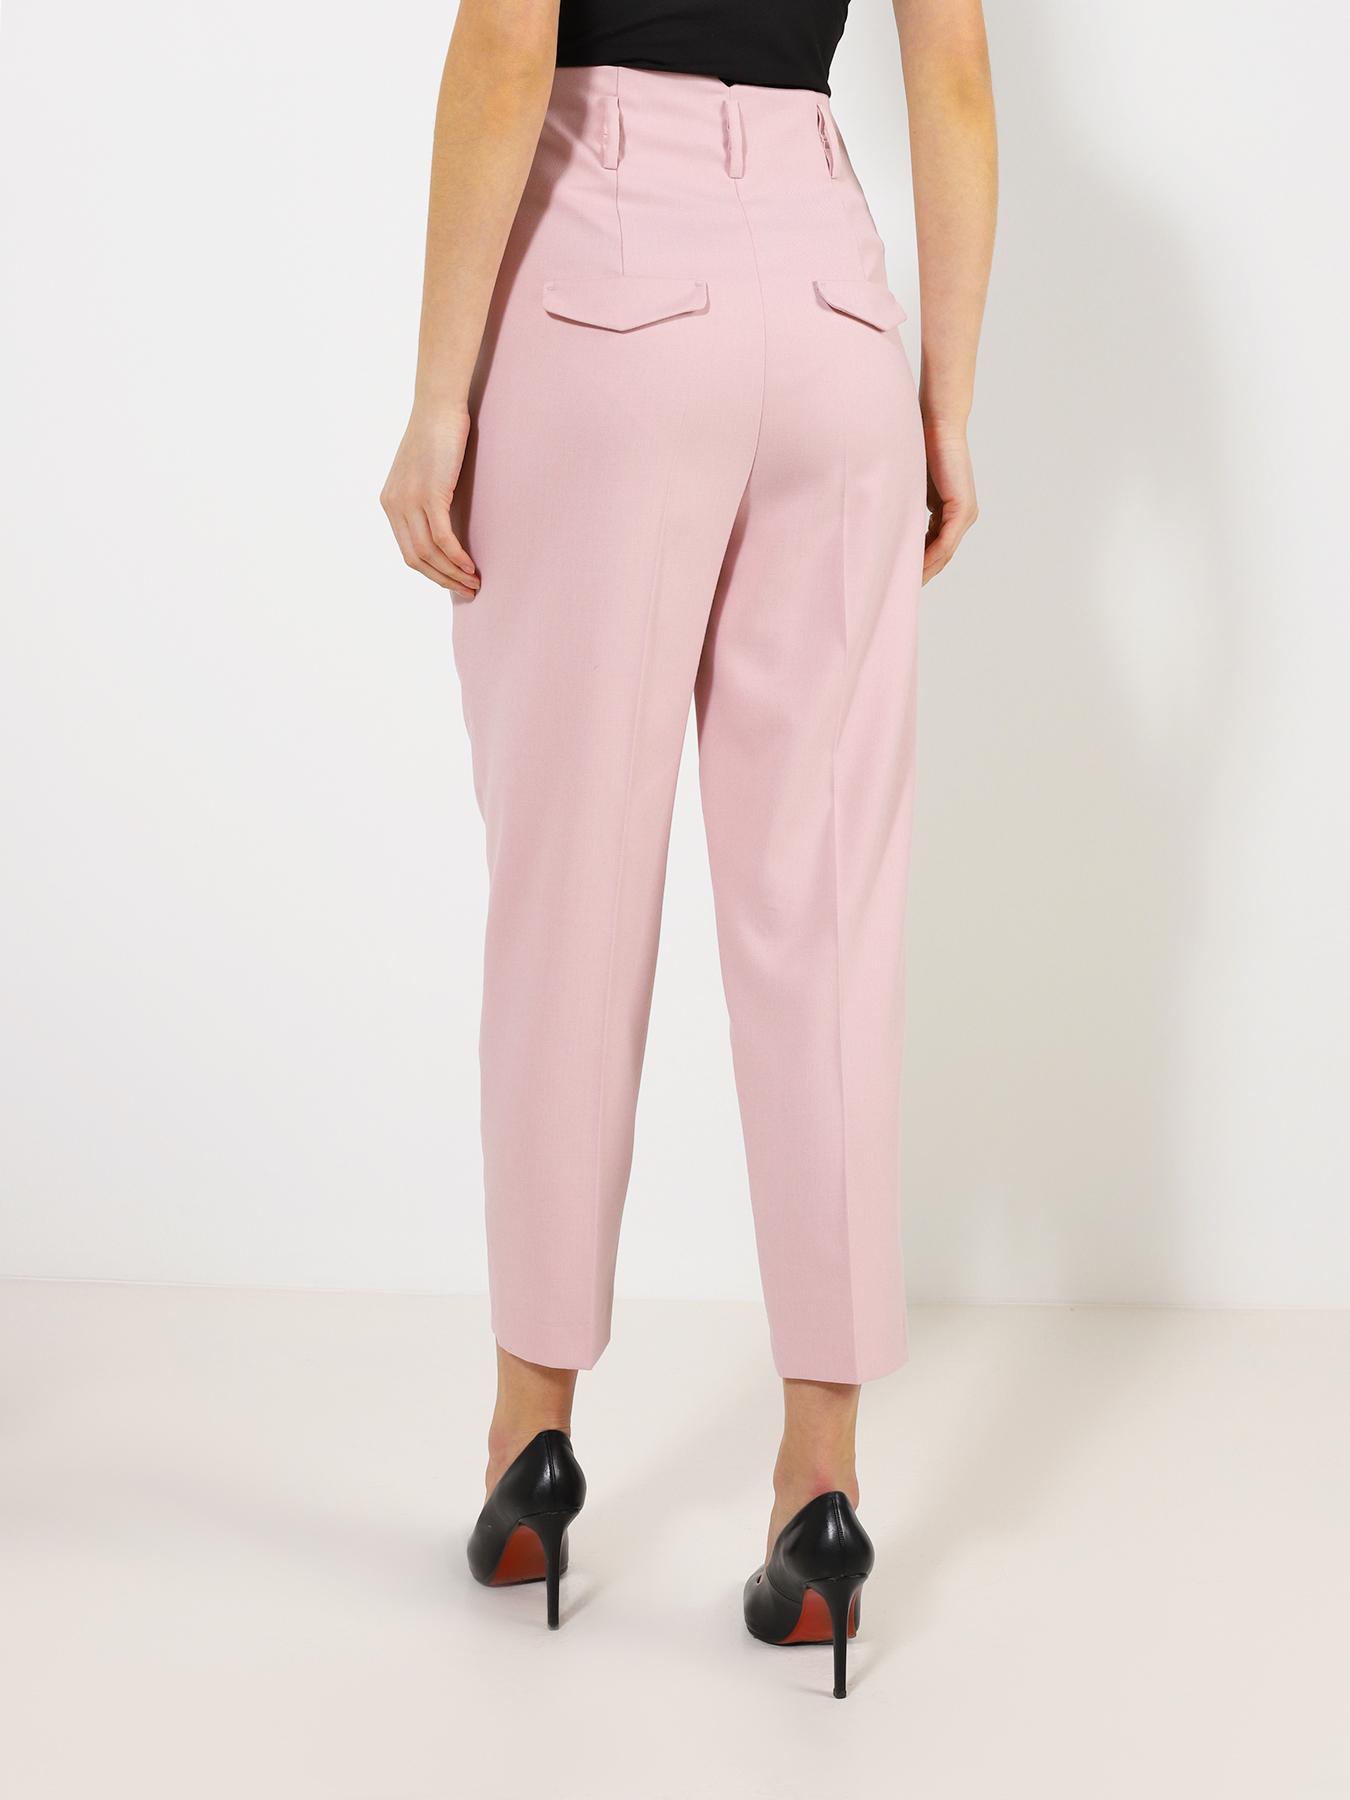 Luisa Cerano Свободные брюки 357227-022 Фото 2